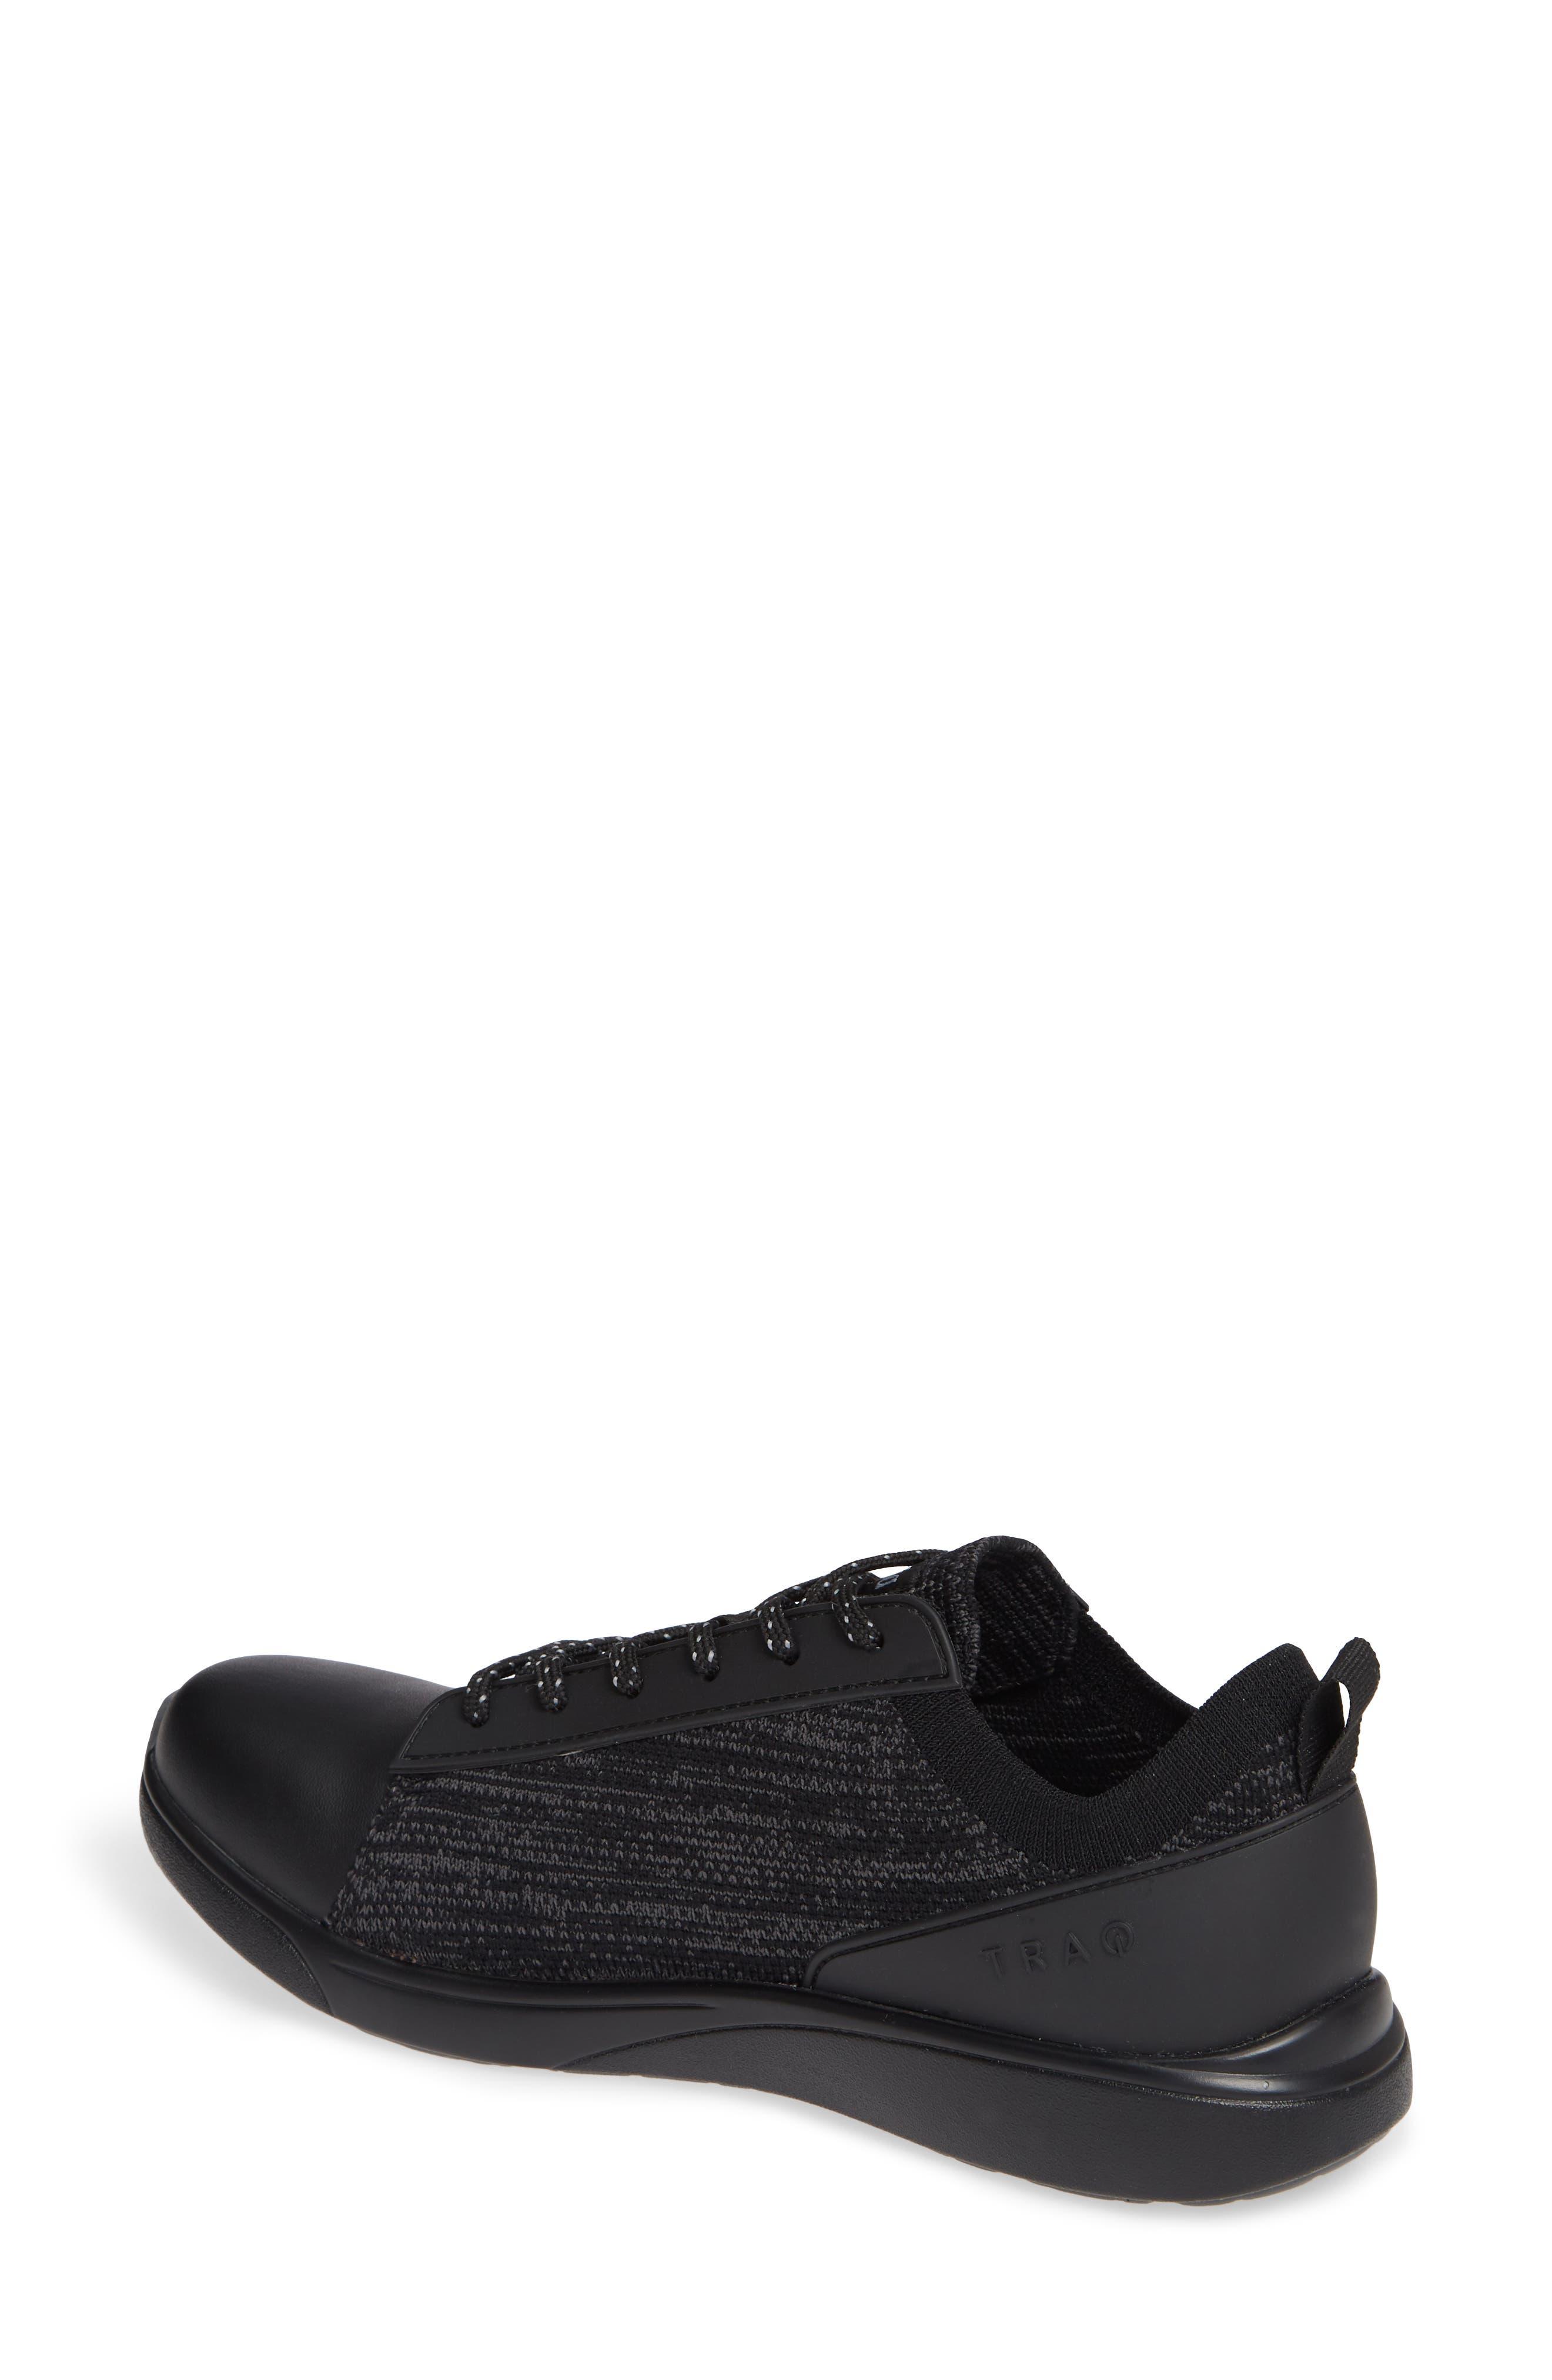 ALEGRIA, Qest Sneaker, Alternate thumbnail 2, color, BLACK LEATHER